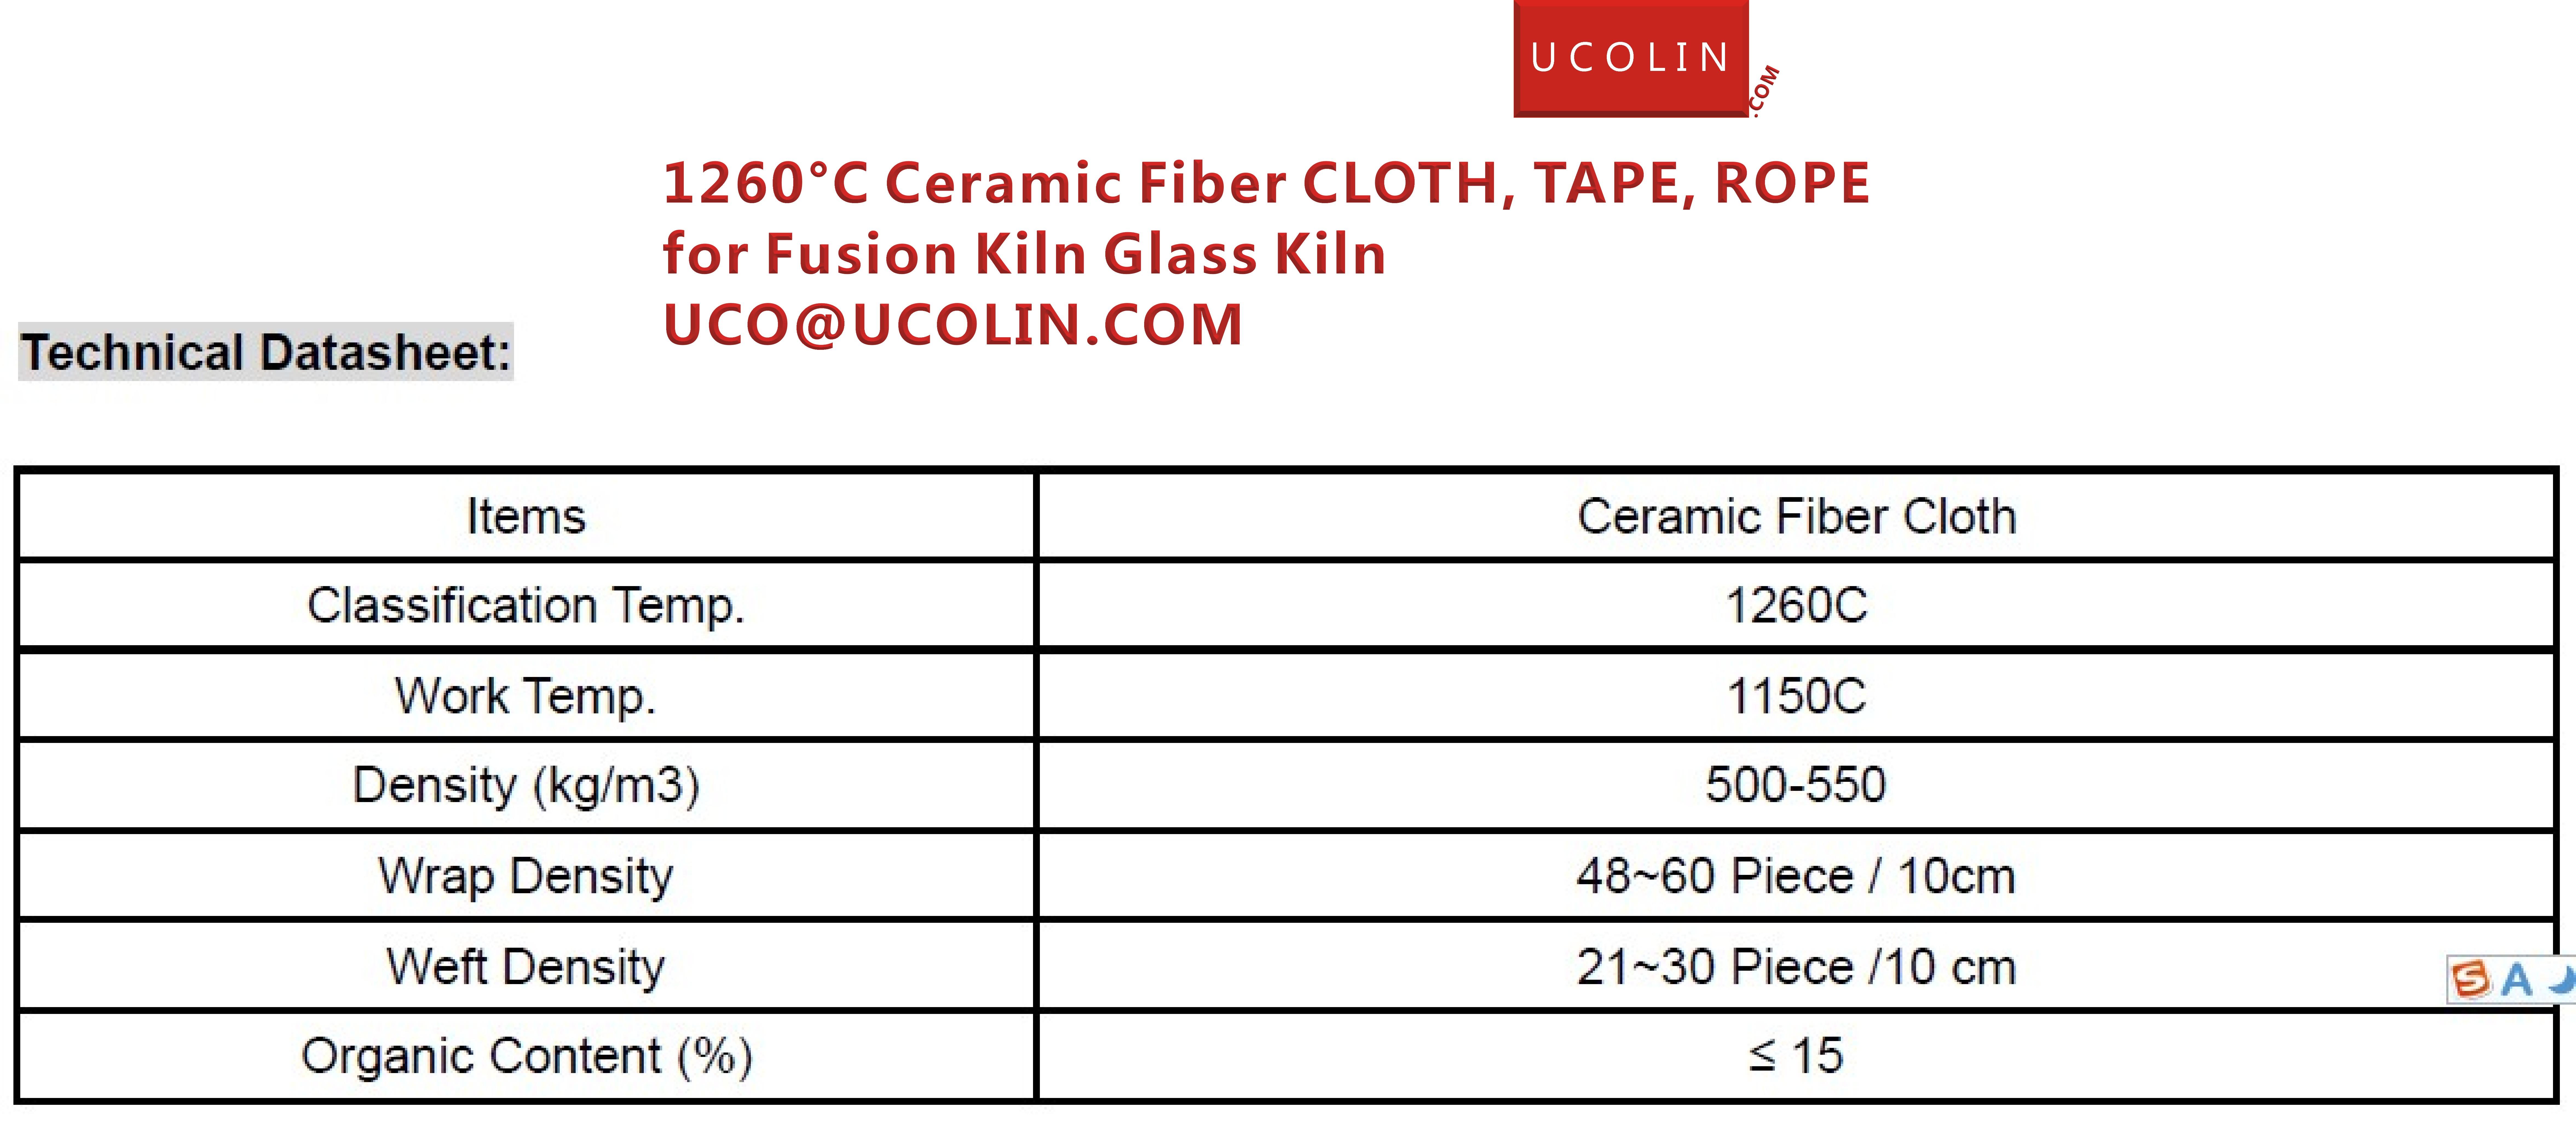 02  1260°C Ceramic Fiber CLOTH, TAPE, ROPE for Fusion Kiln Glass Kiln